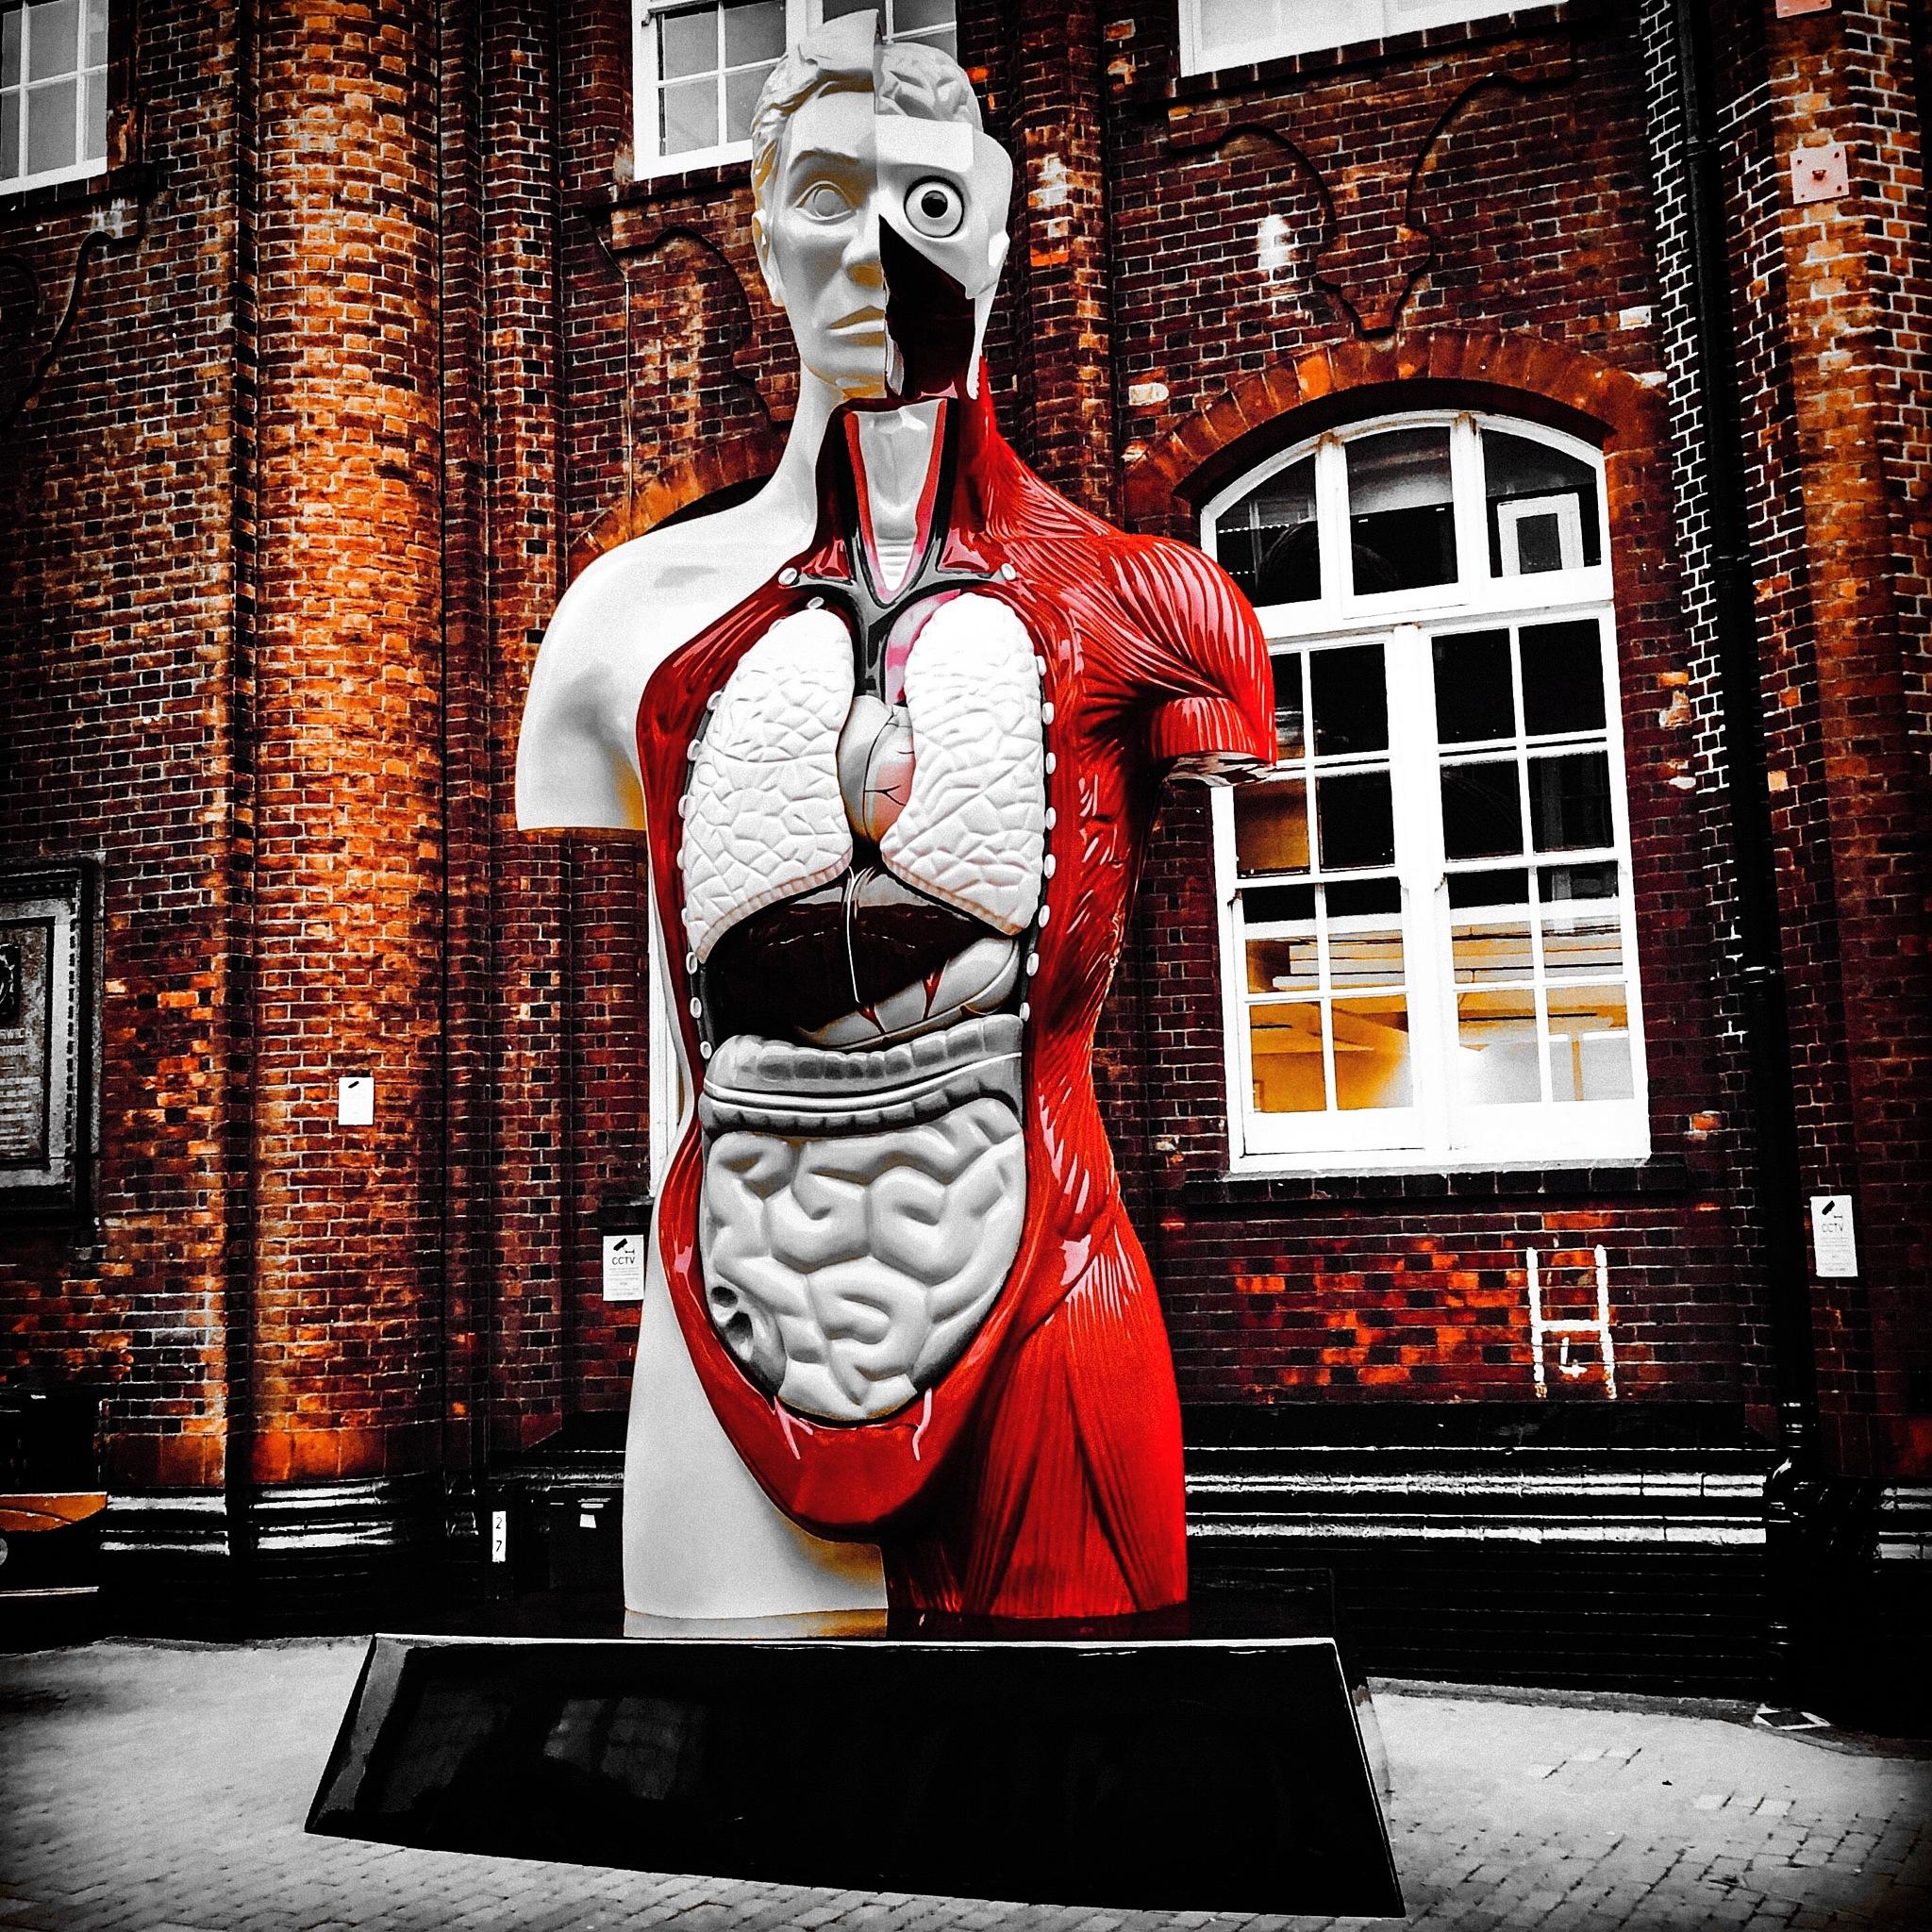 Damien Hirst installation  by Dylan Mccarthy